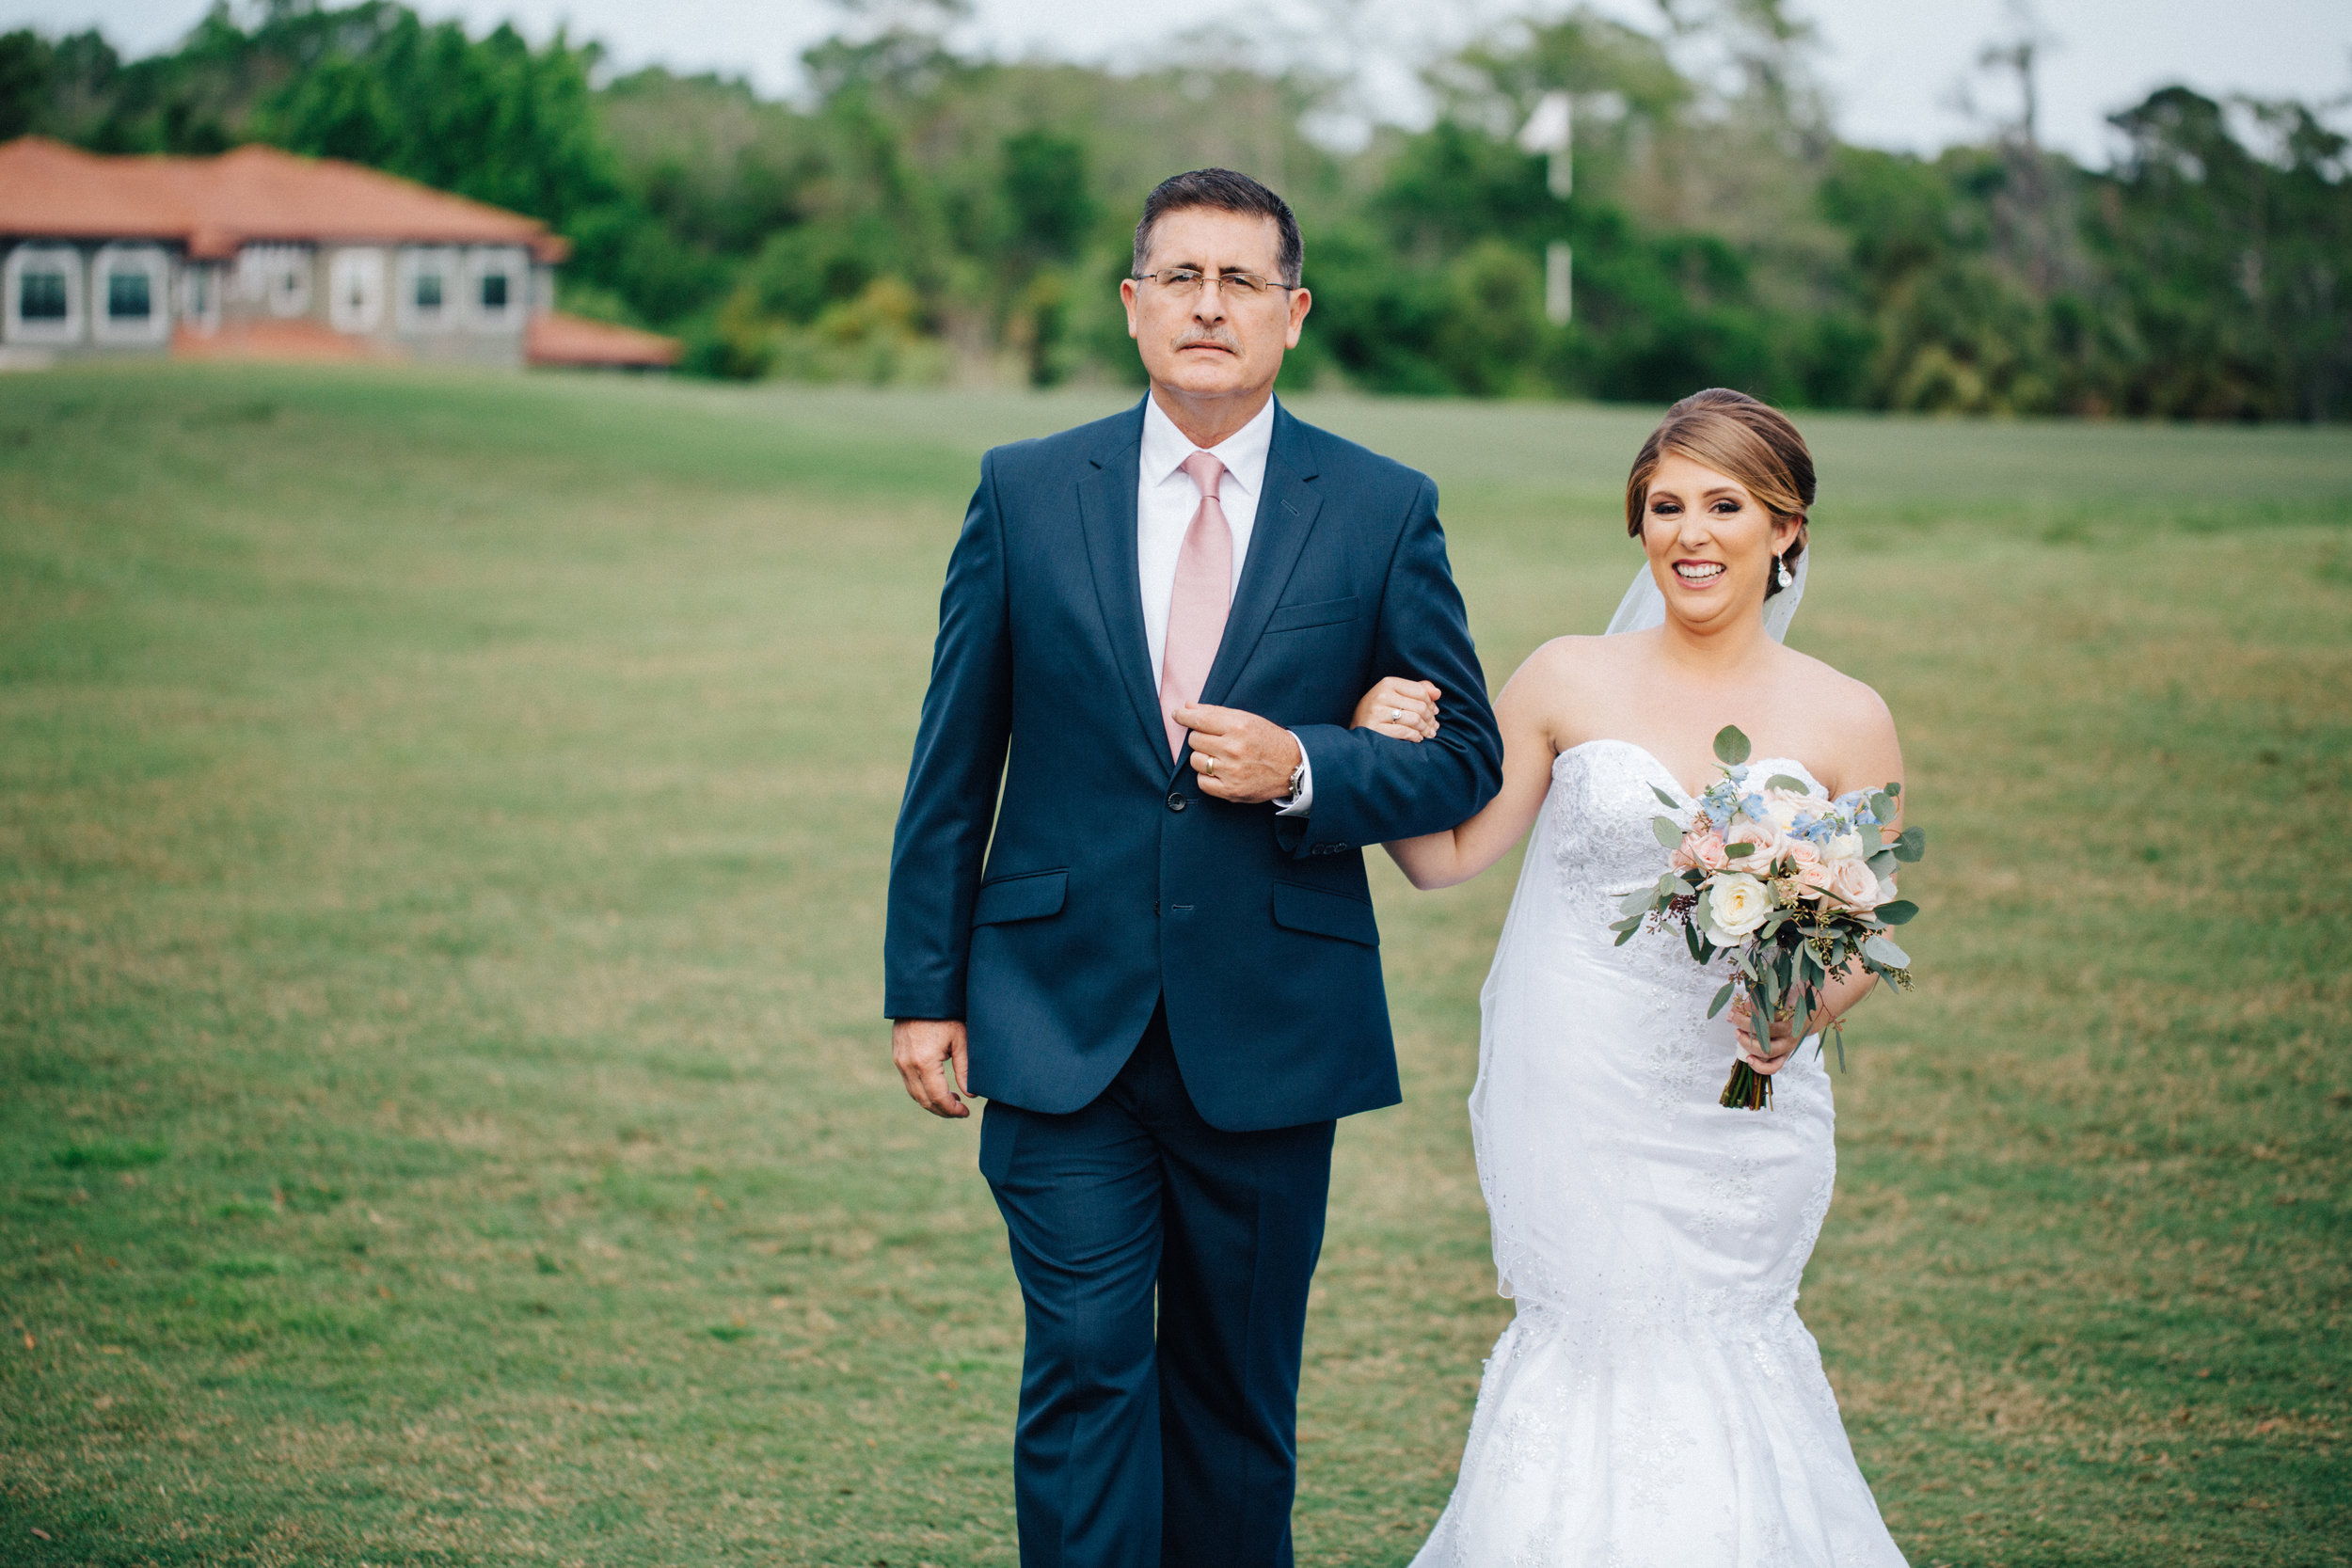 Tuskawilla Country Club Wedding Photographer-46.jpg